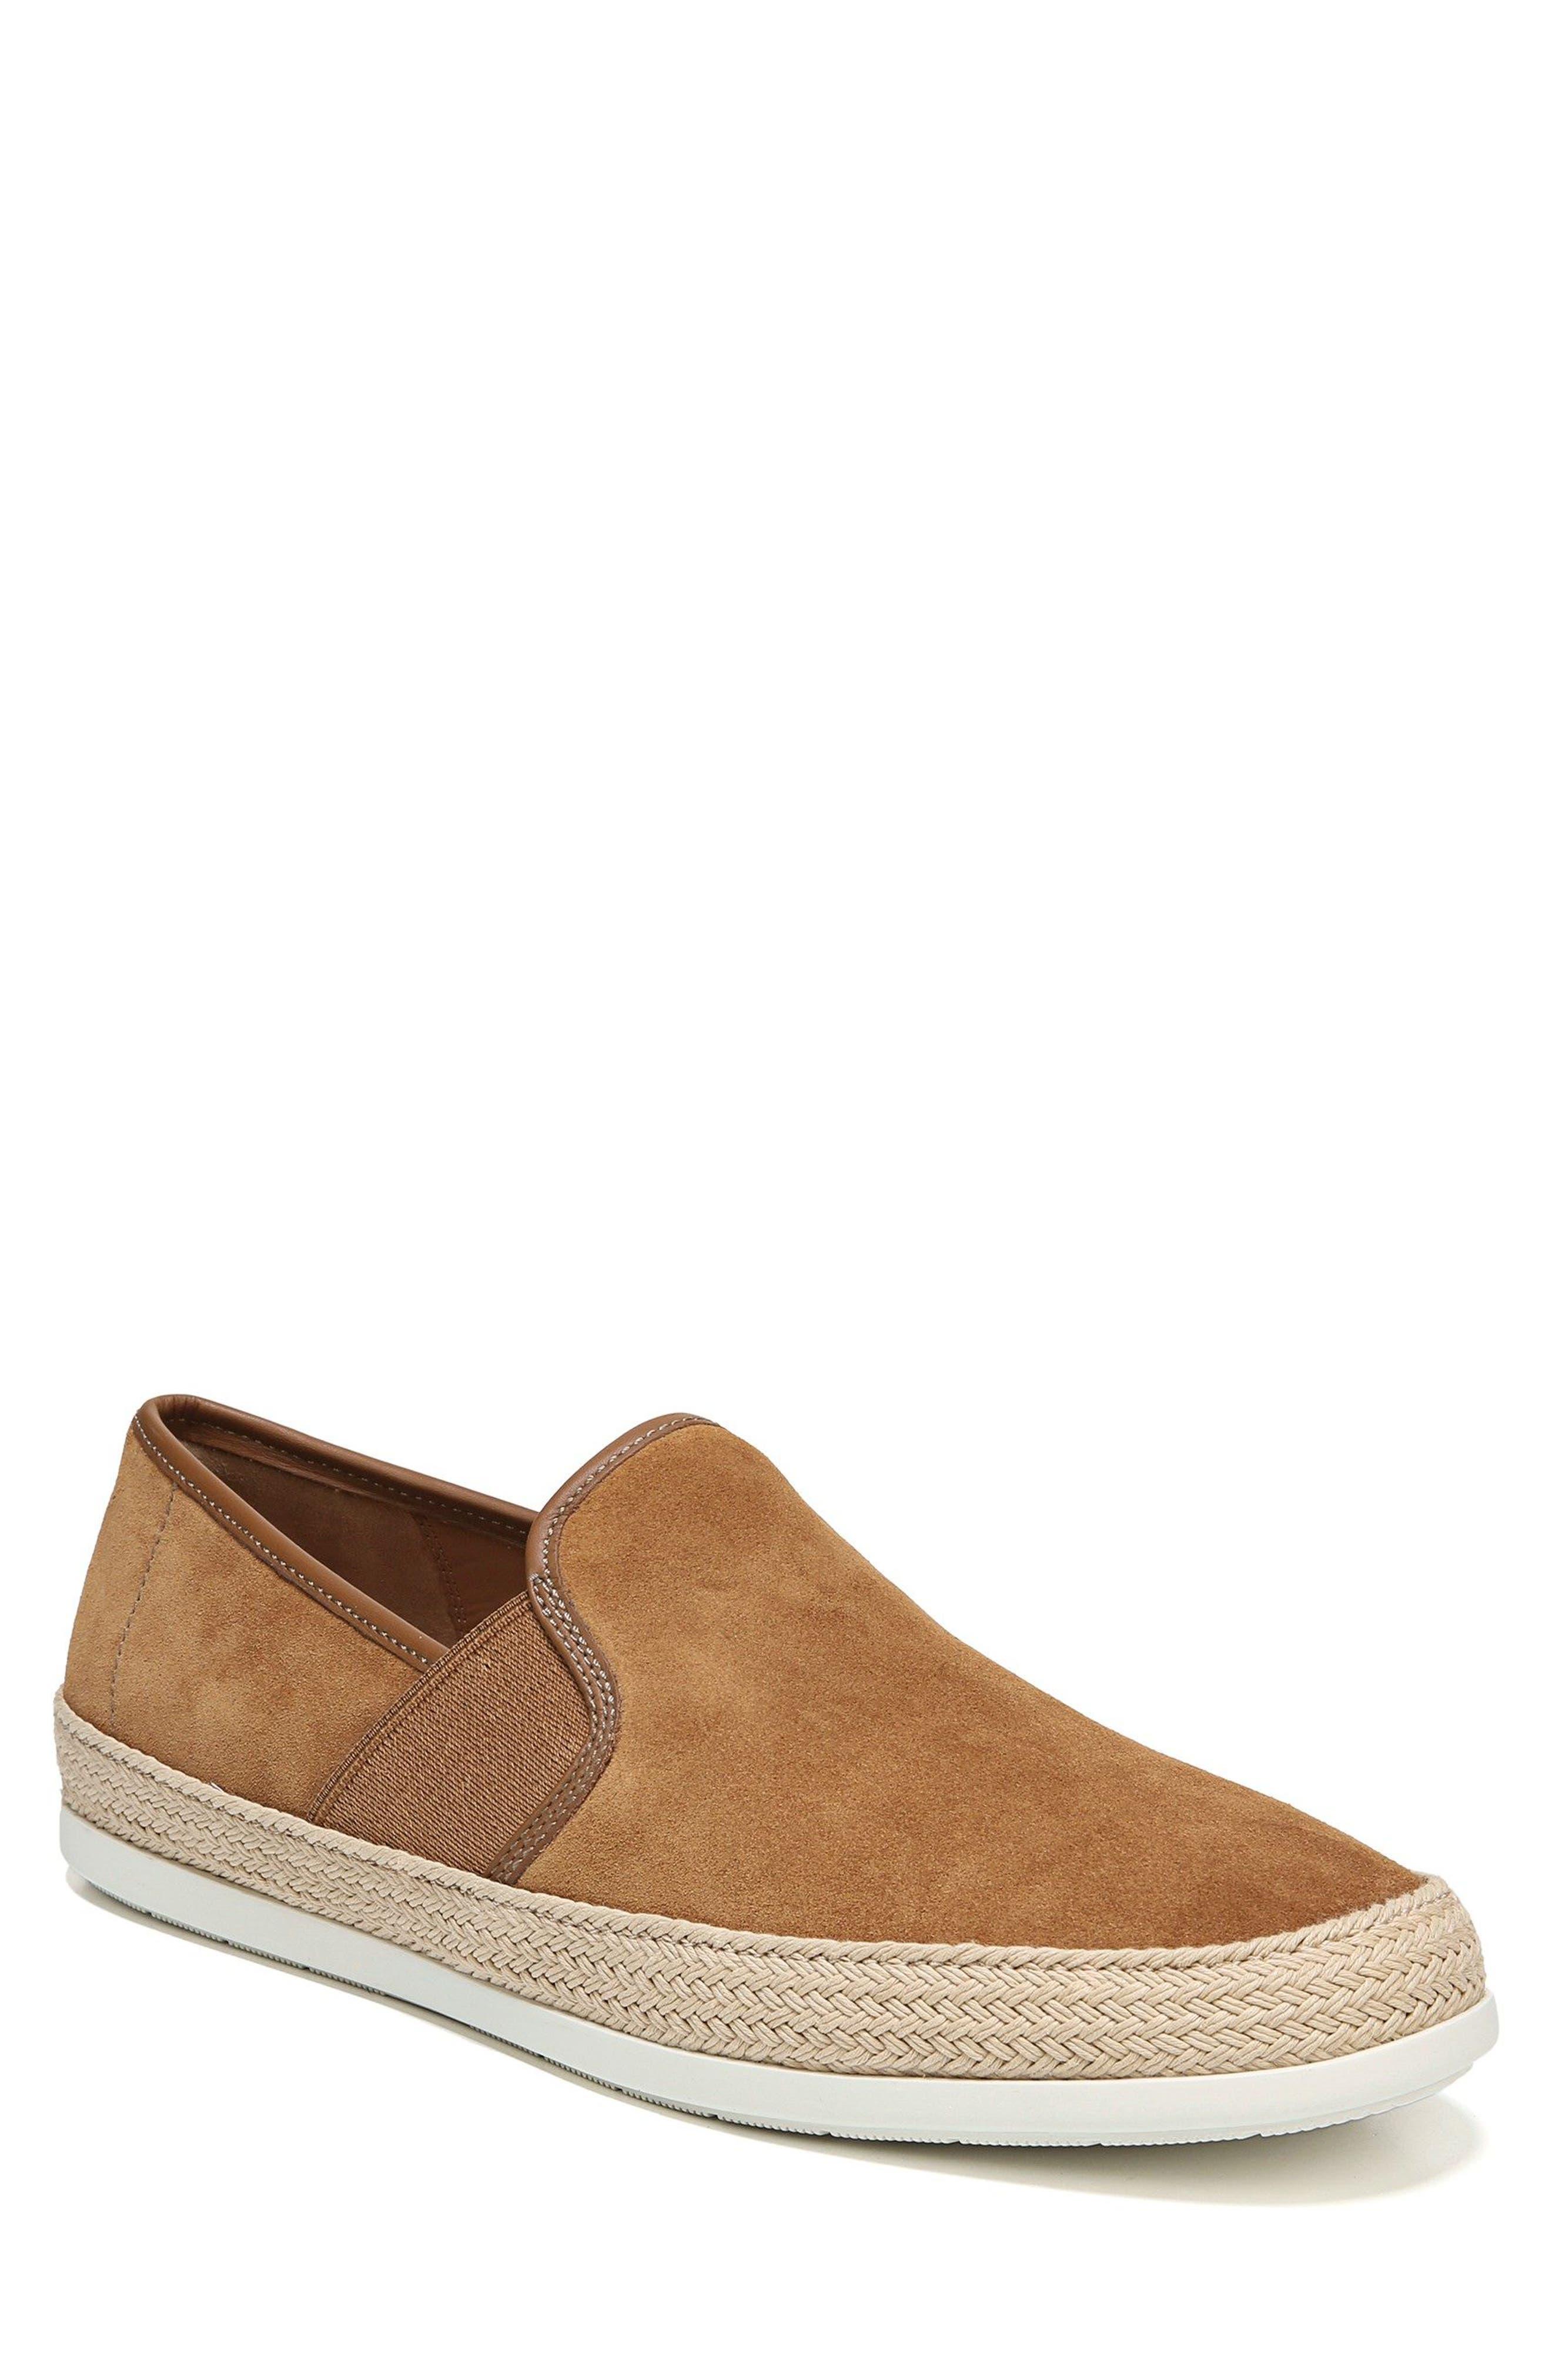 Vince Chad Espadrille Slip-On Sneaker (Men)